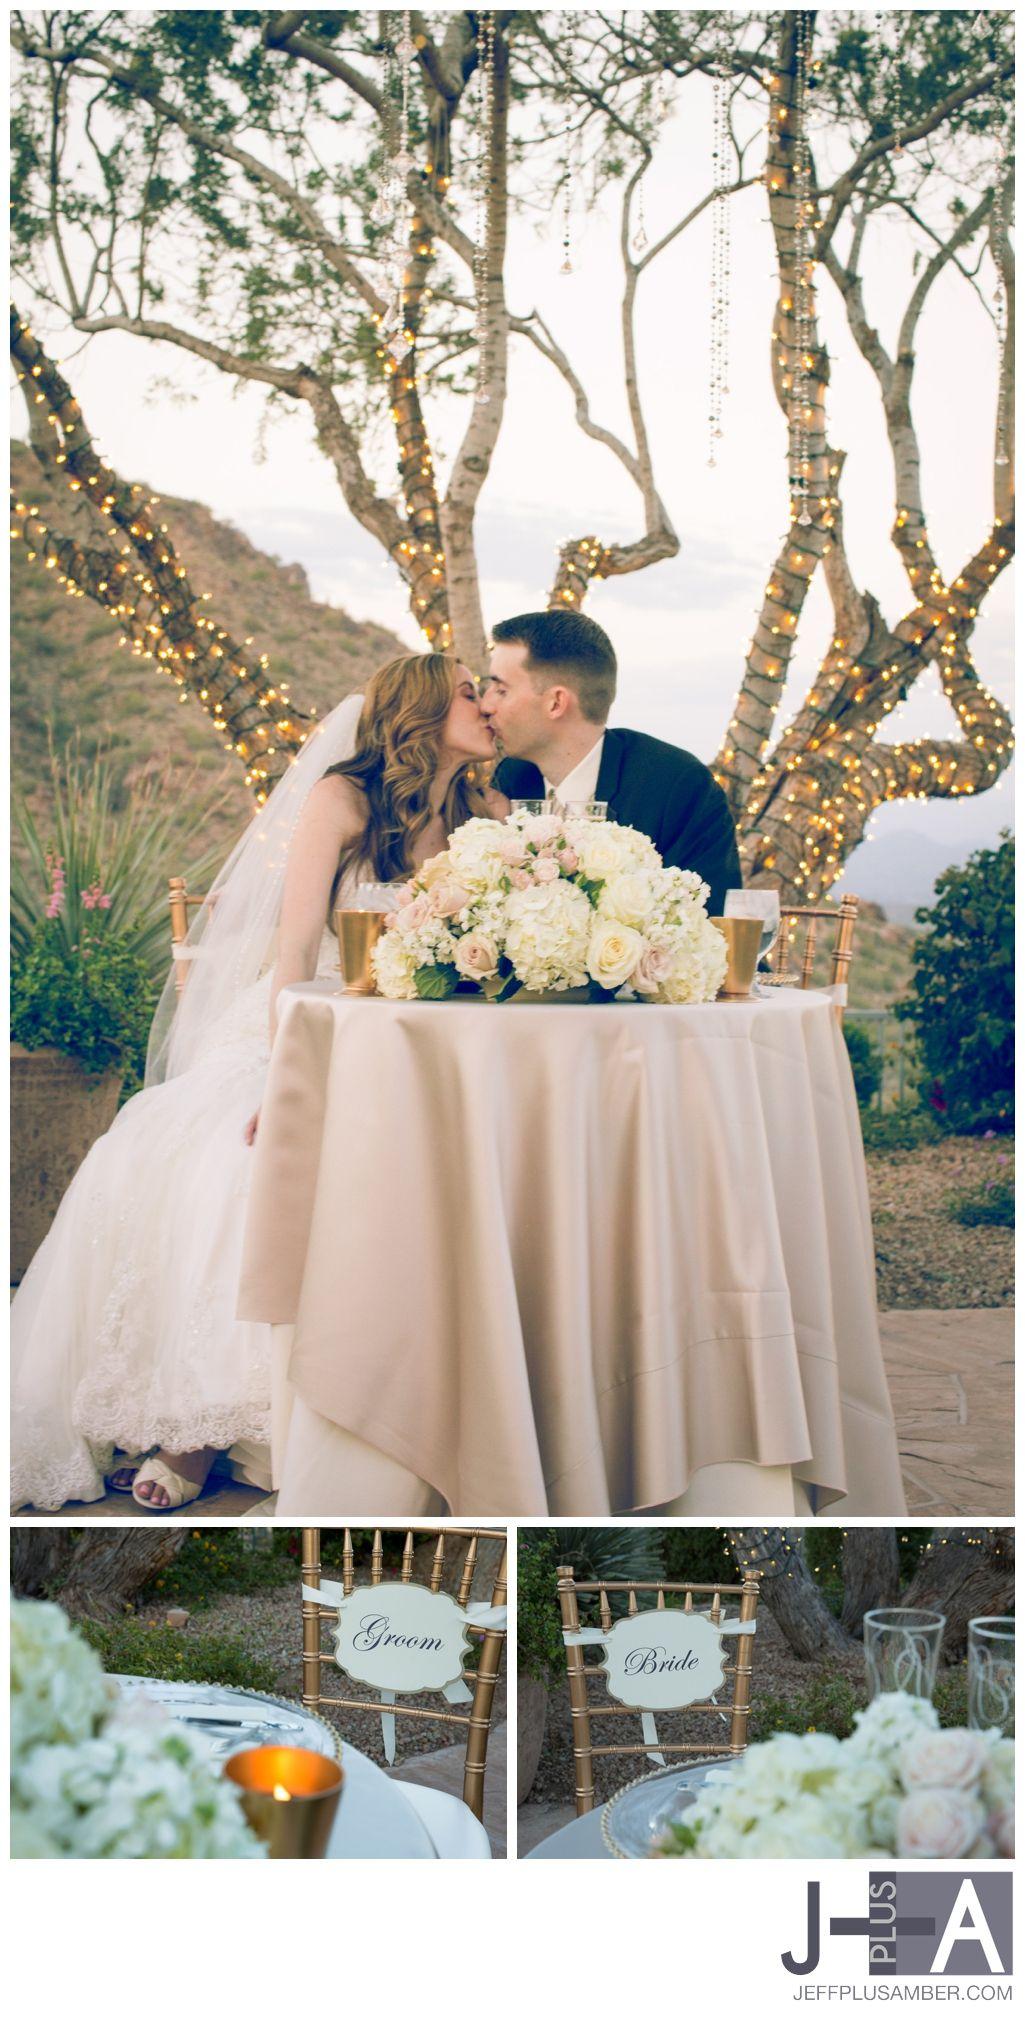 Rebecca + James - Copperwynd Wedding Fountain Hills AZ ...